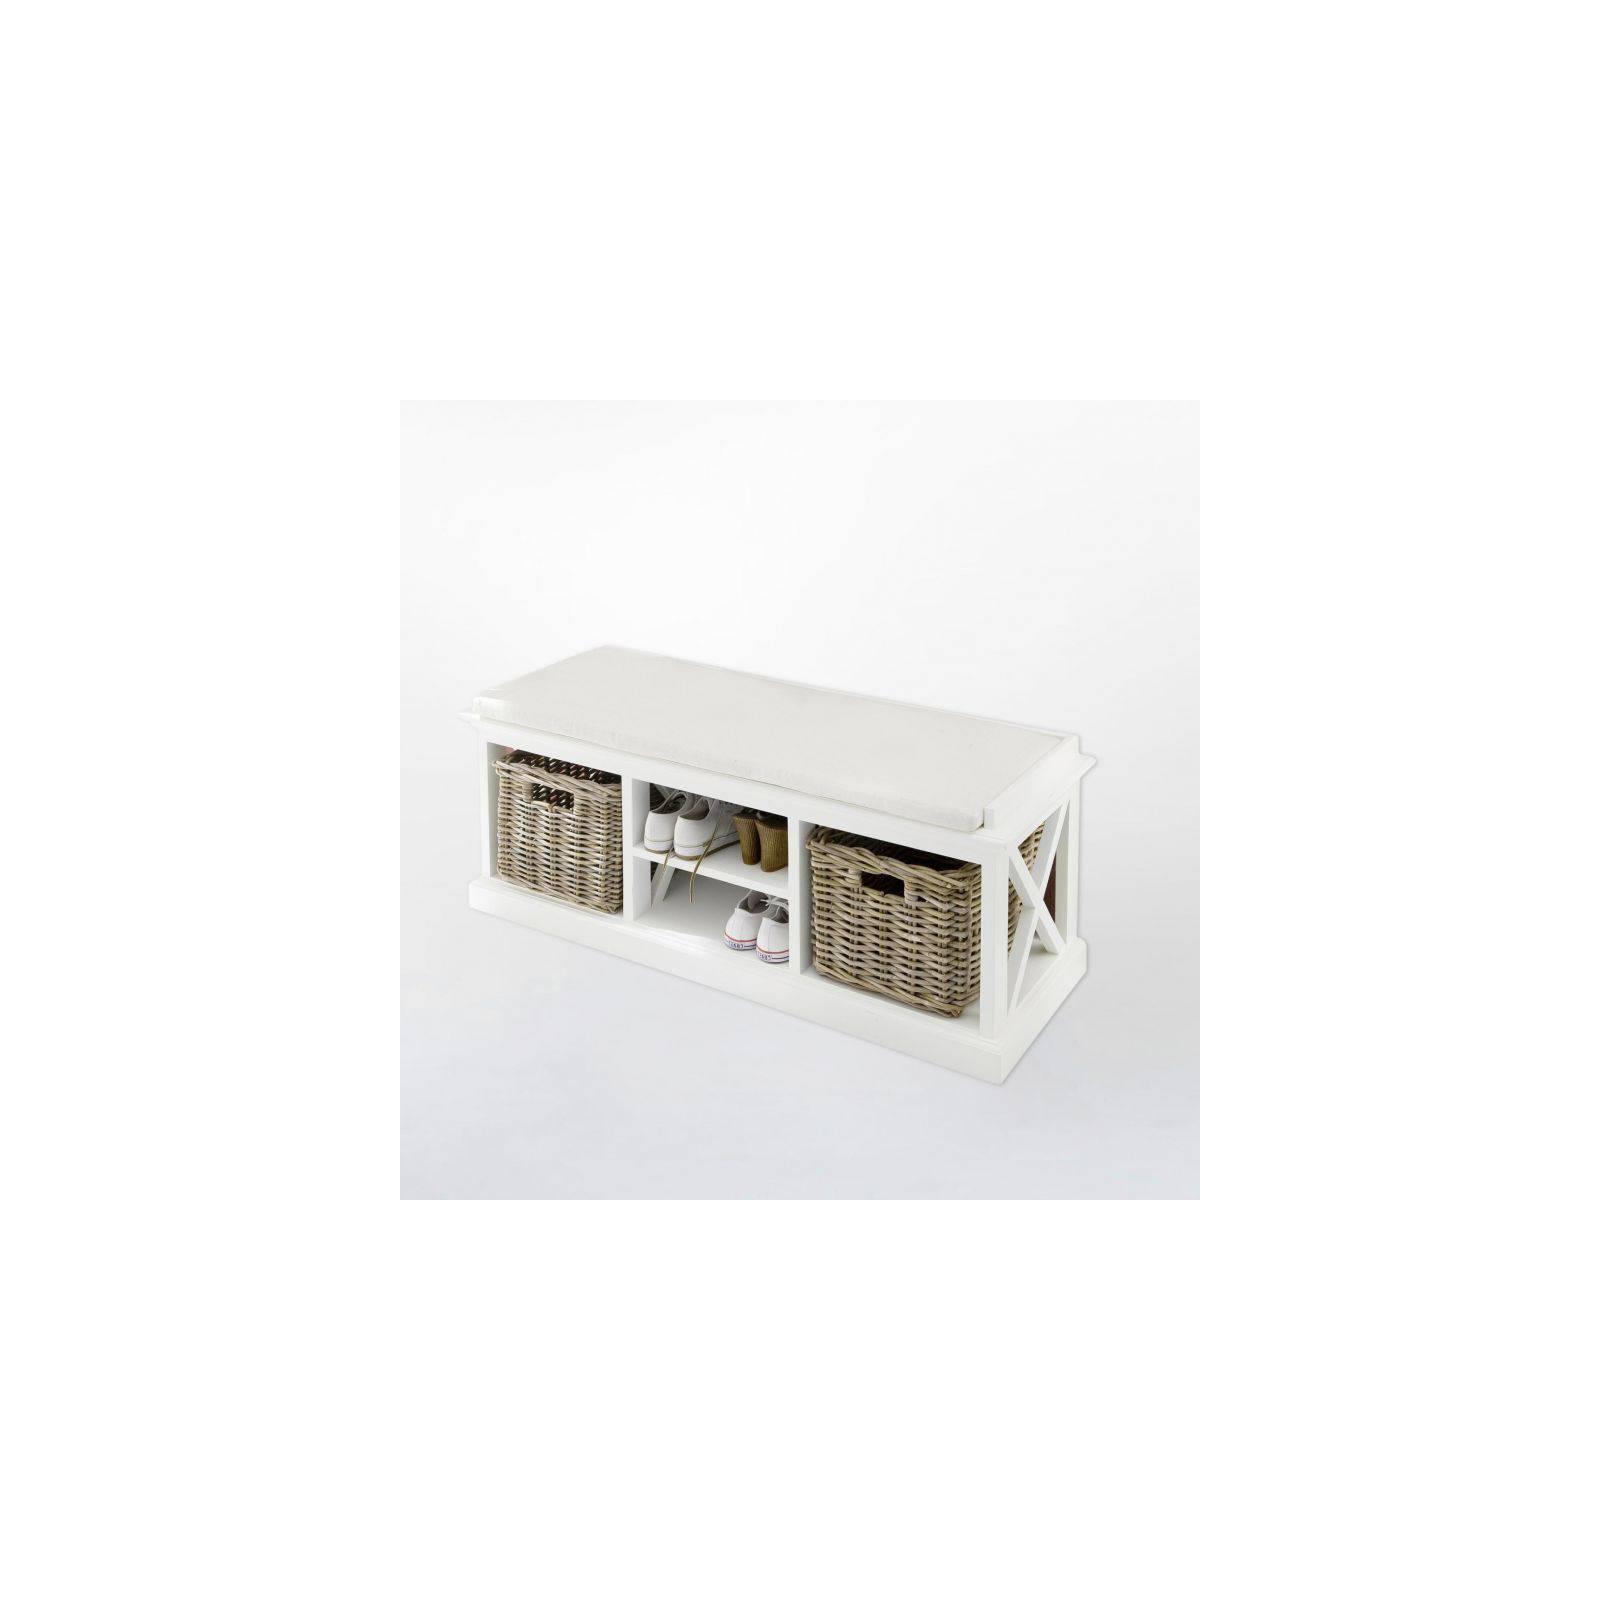 Banc Paniers Torini Acajou - meuble en bois massif